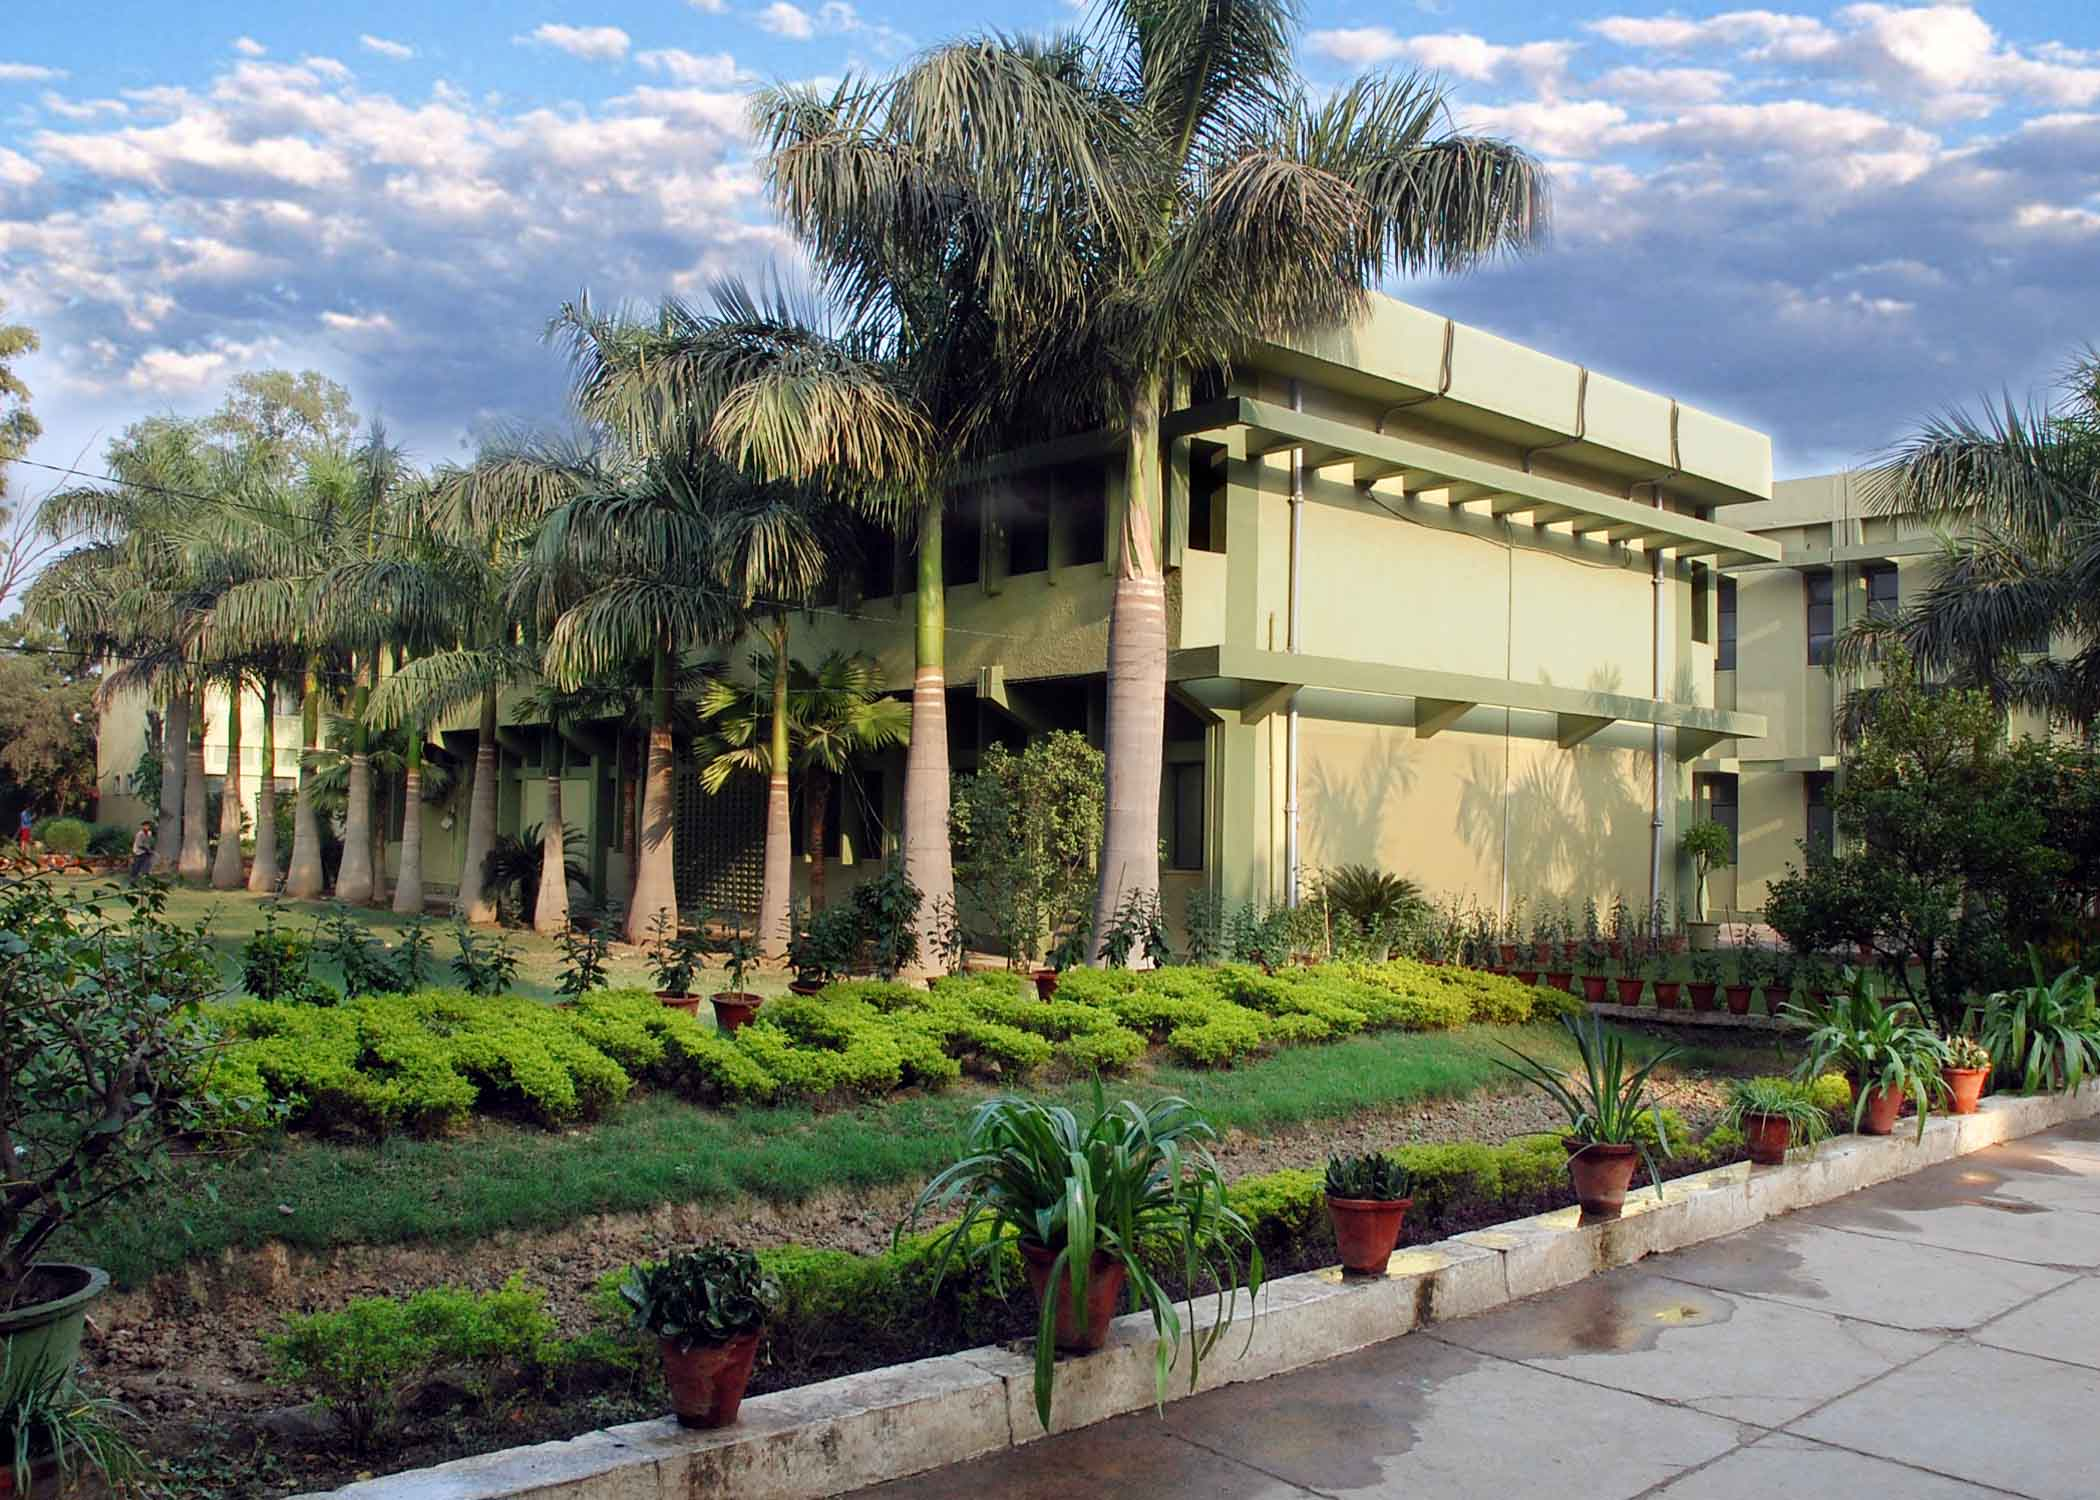 RAMJAS SCHOOL SECTOR IV R K PURAM NEW DELHI 2730020